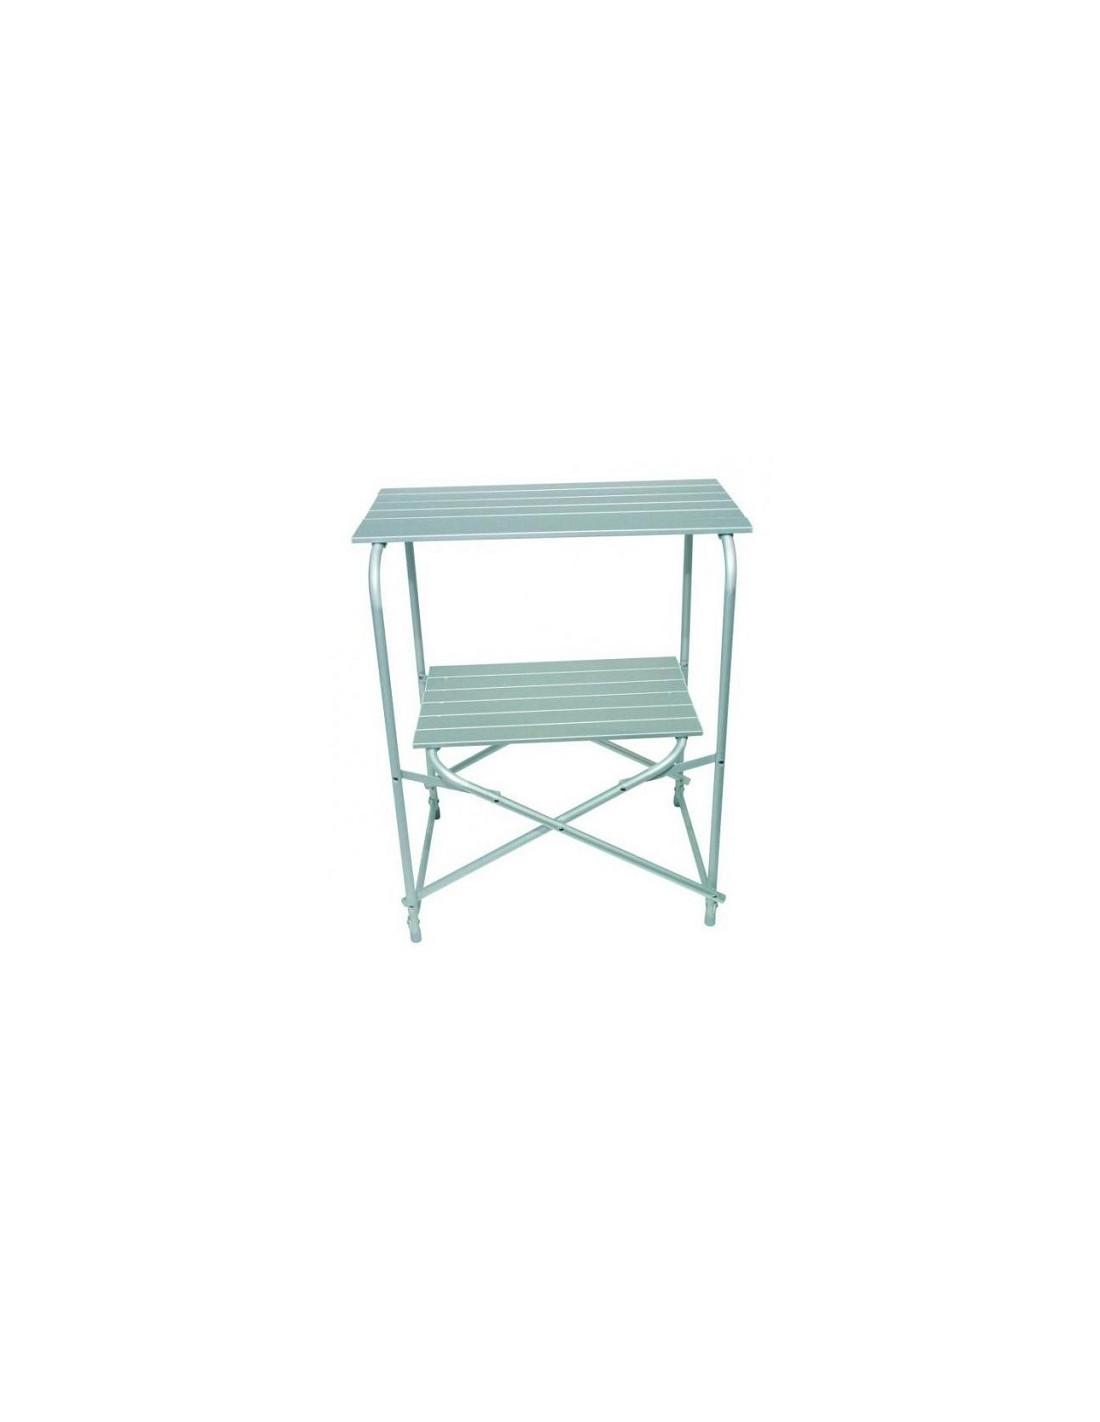 Mueble mesa cocina en aluminio midland pliant laki for Mueble de aluminio exterior